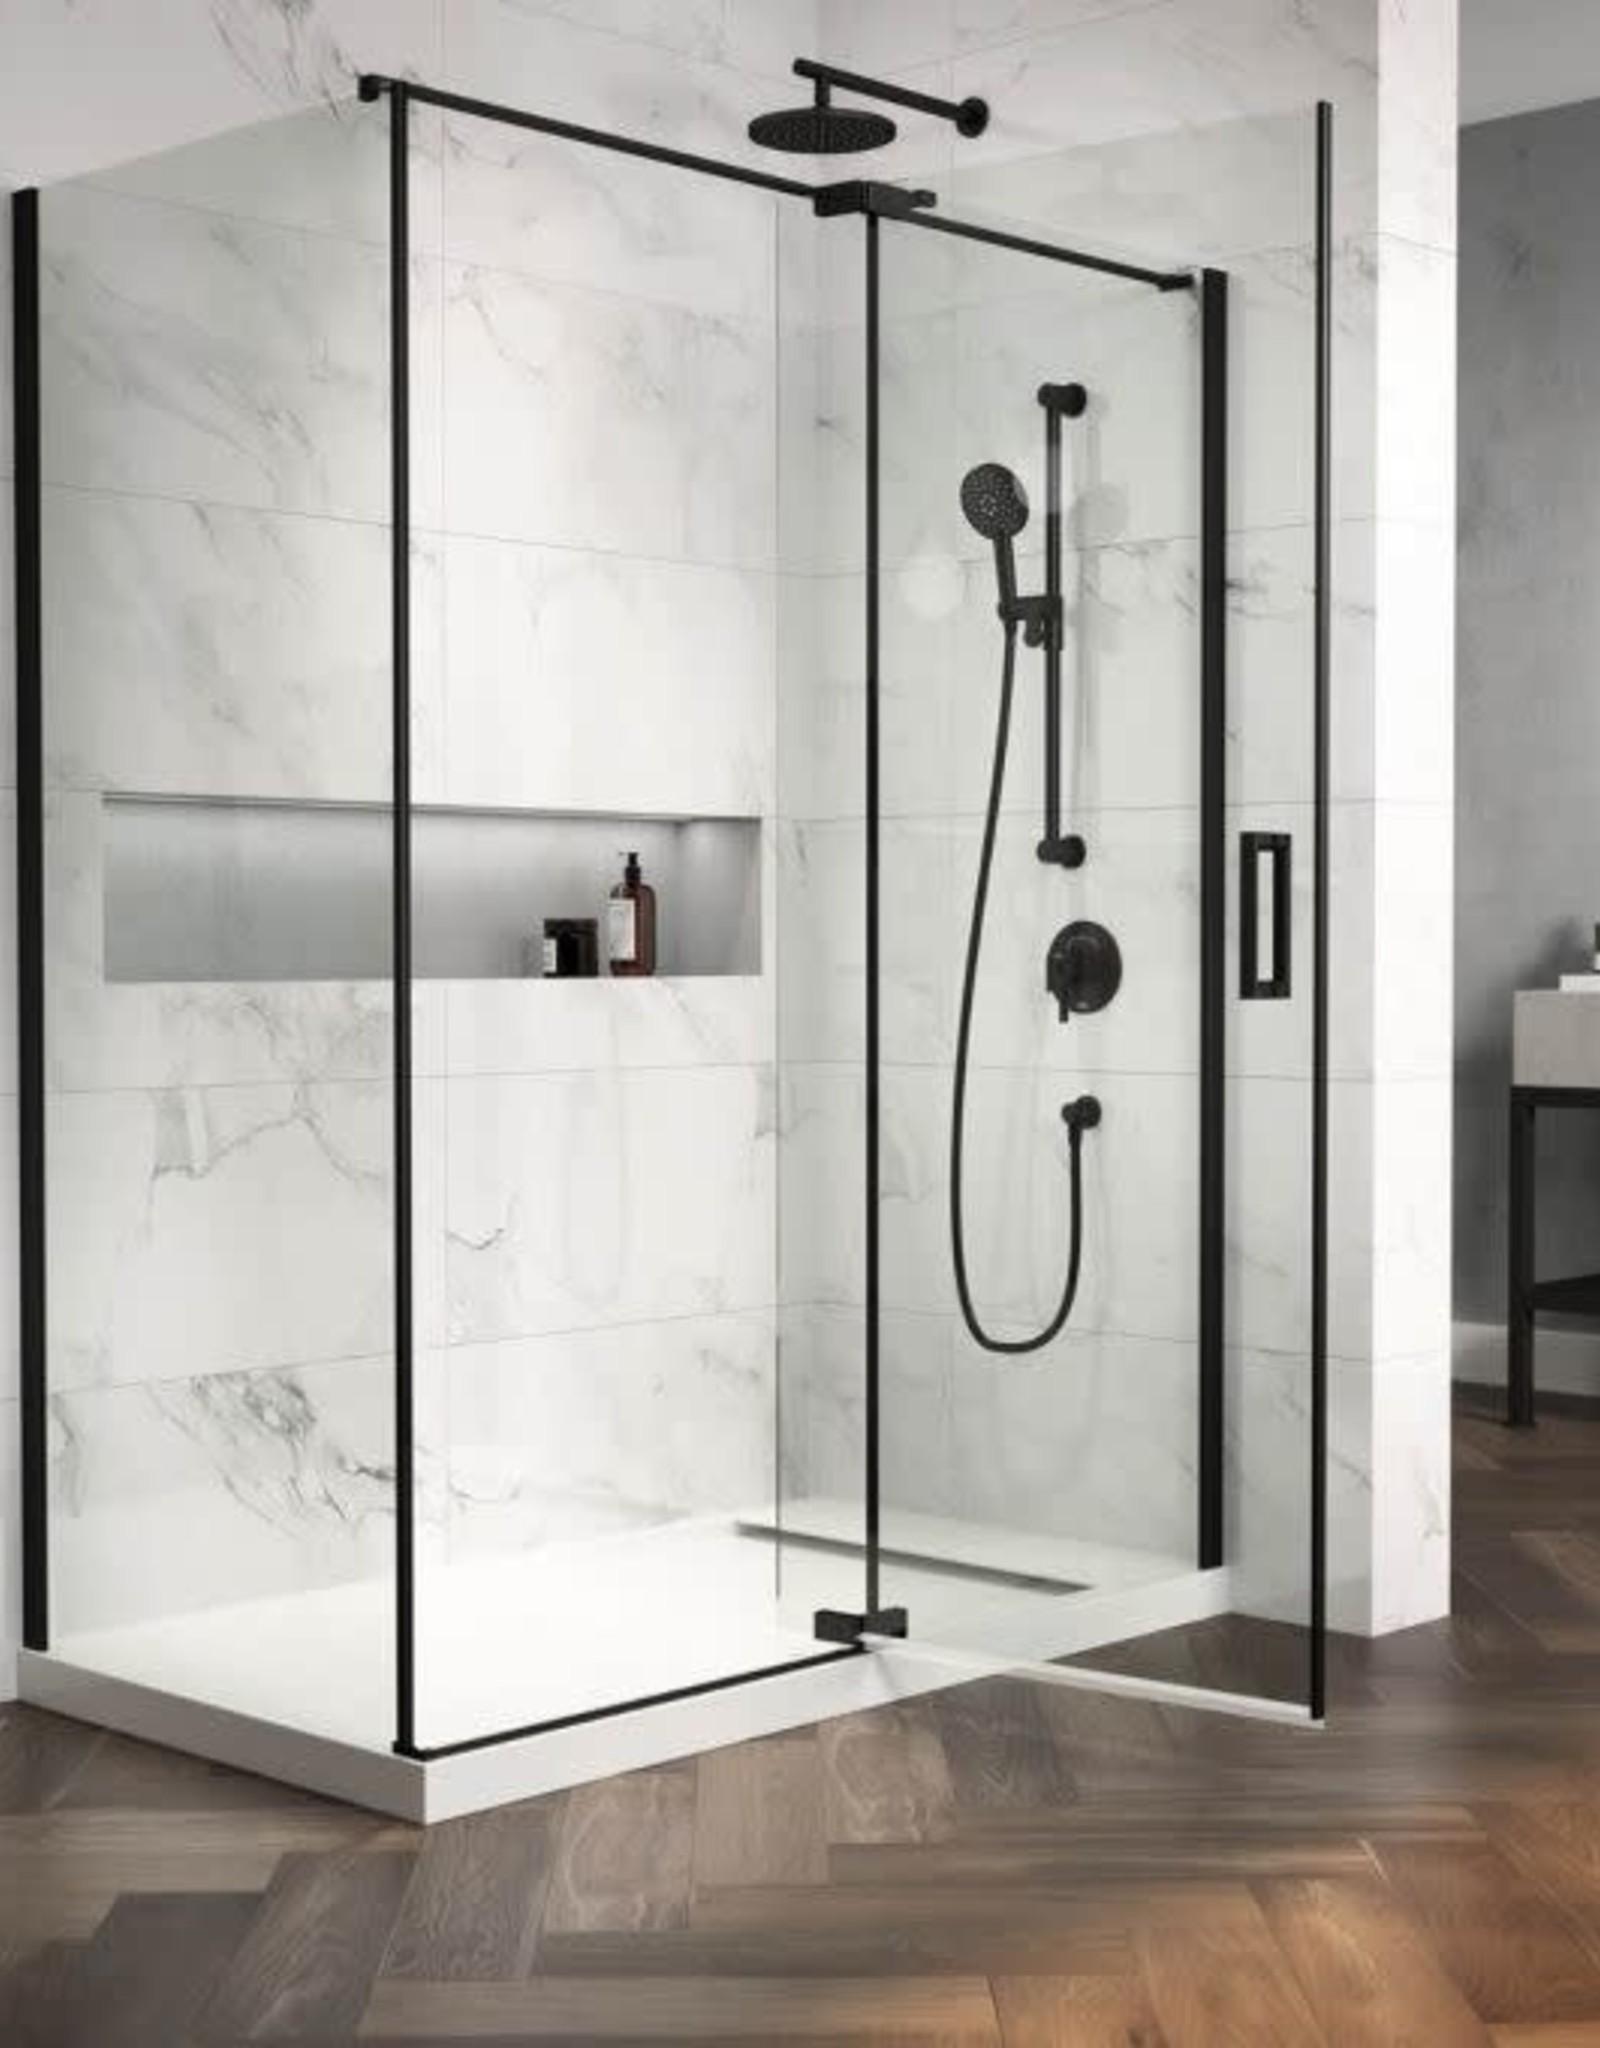 "Kalia Kalia Distink Pivot Shower Door 36"" x 36"" Corner Install- Matte Black"